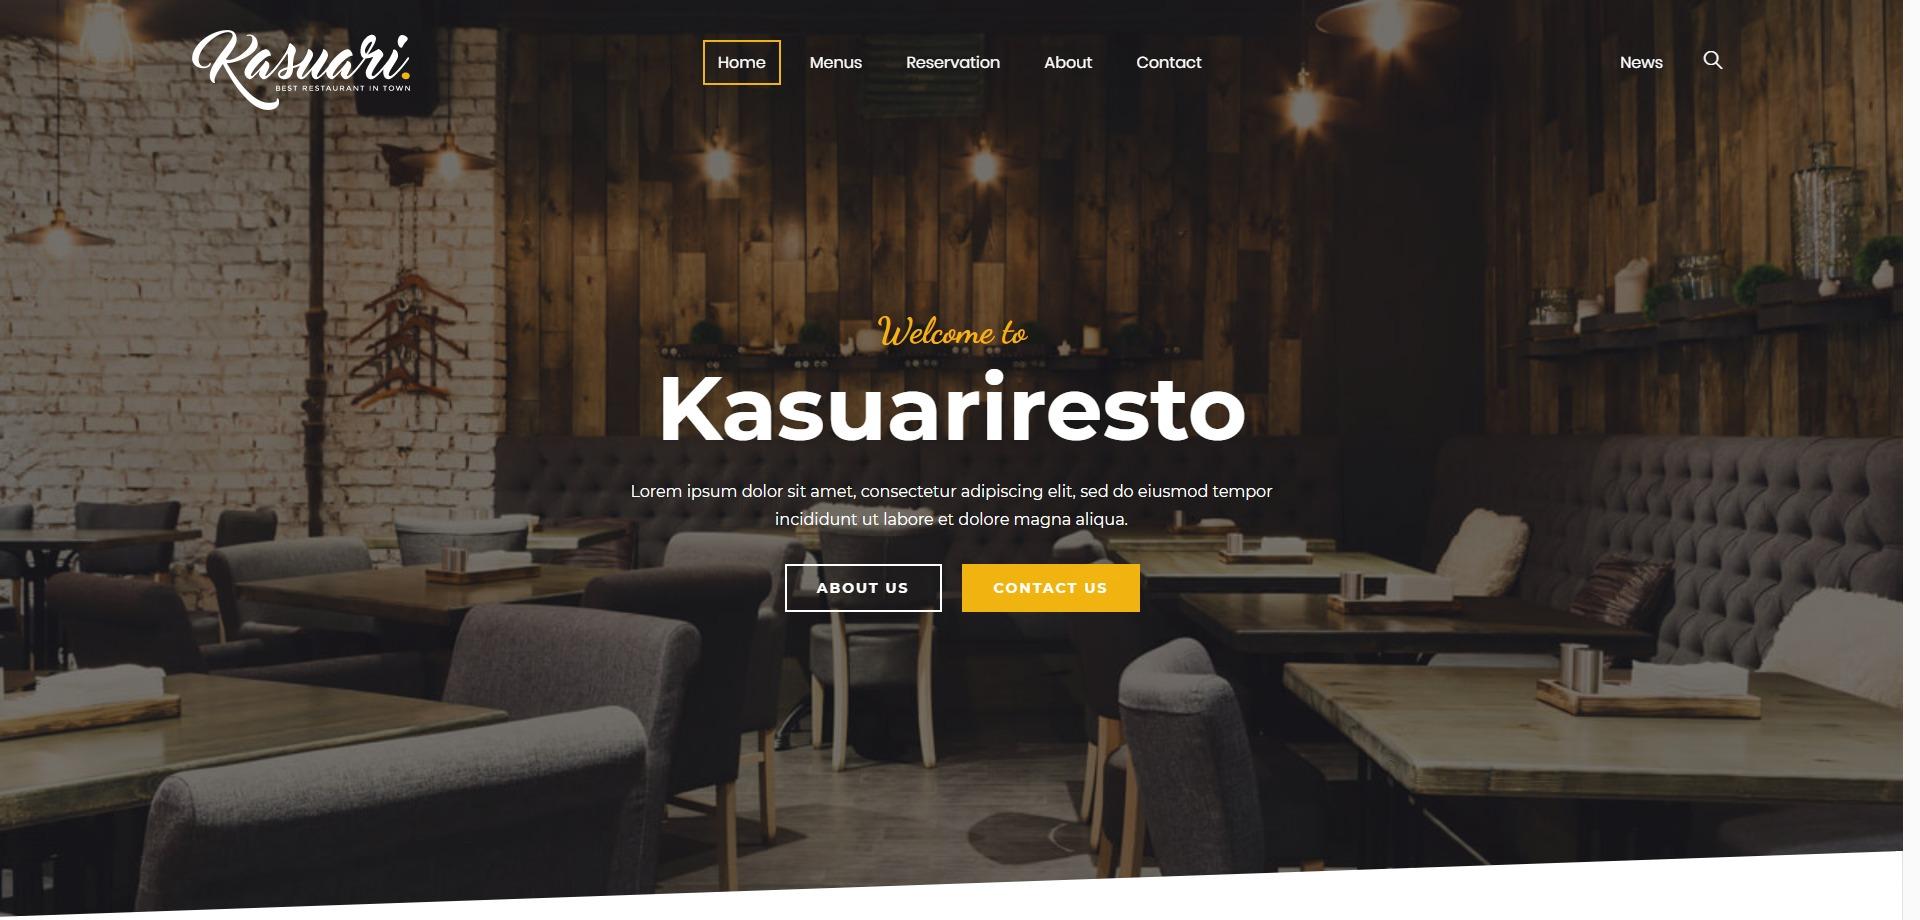 Kasuari-餐饮餐厅快餐咖啡厅WordPress主题